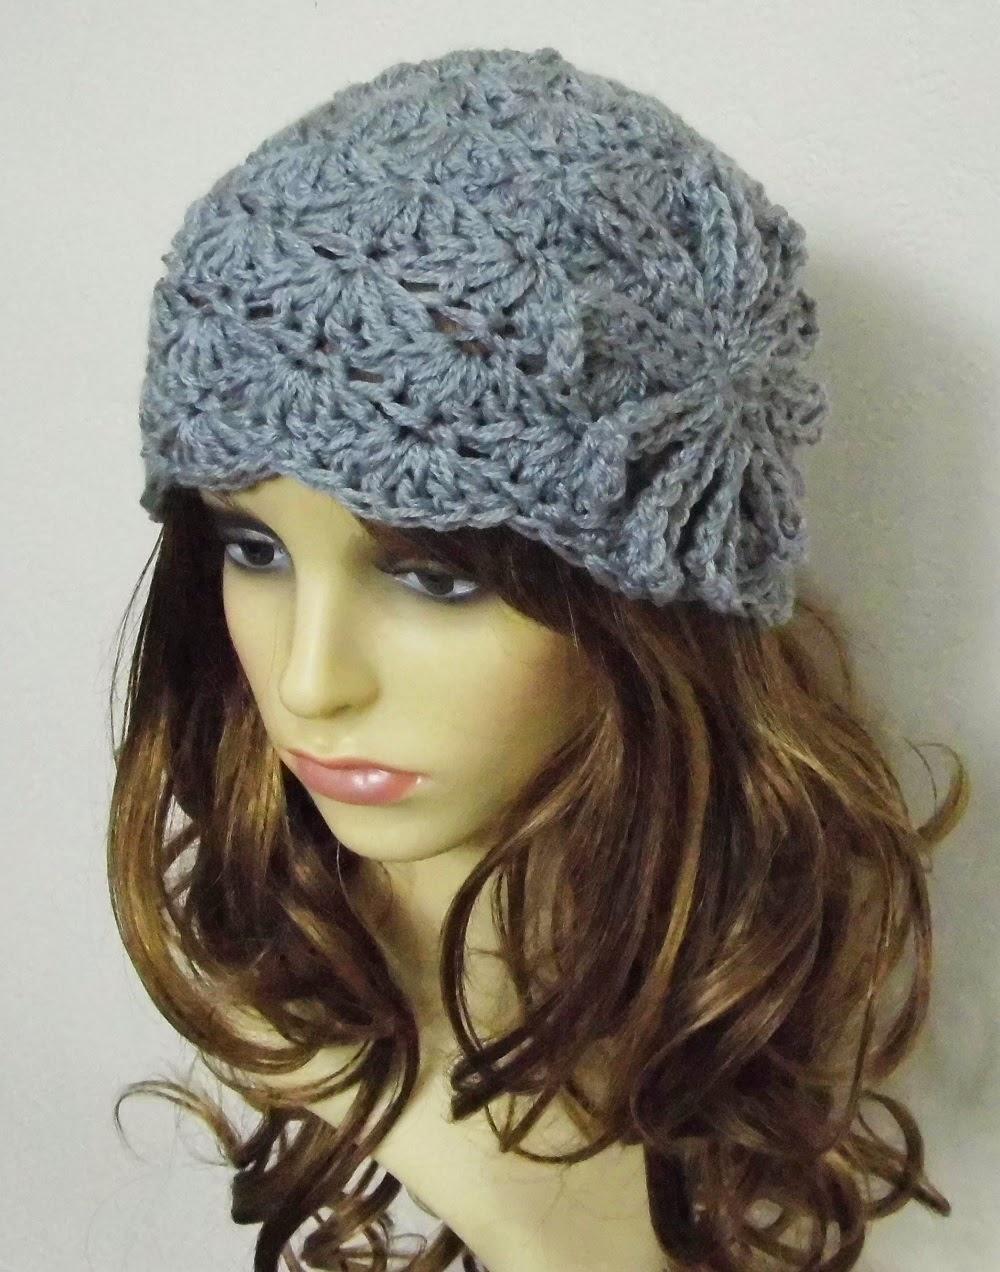 beanies,+beanie,+beanie+hat,+white+hat,+crochet+hats,+hats,+crochet ...